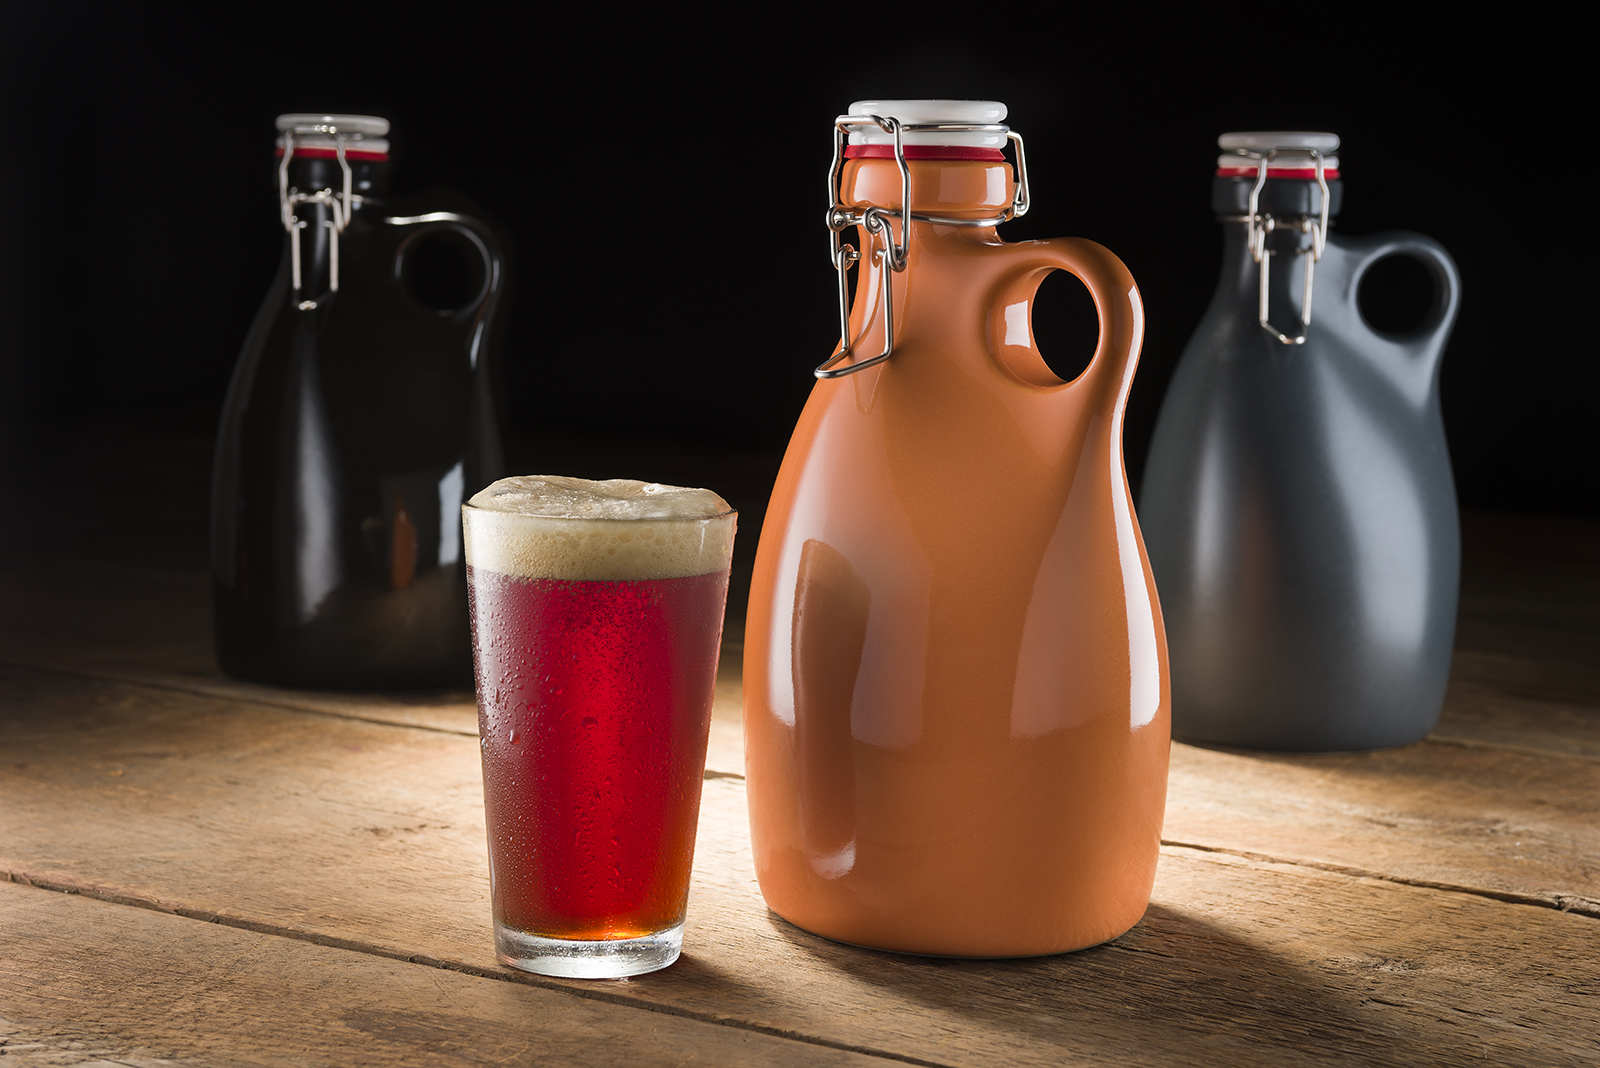 Orange Vessel Company 64oz beer growler